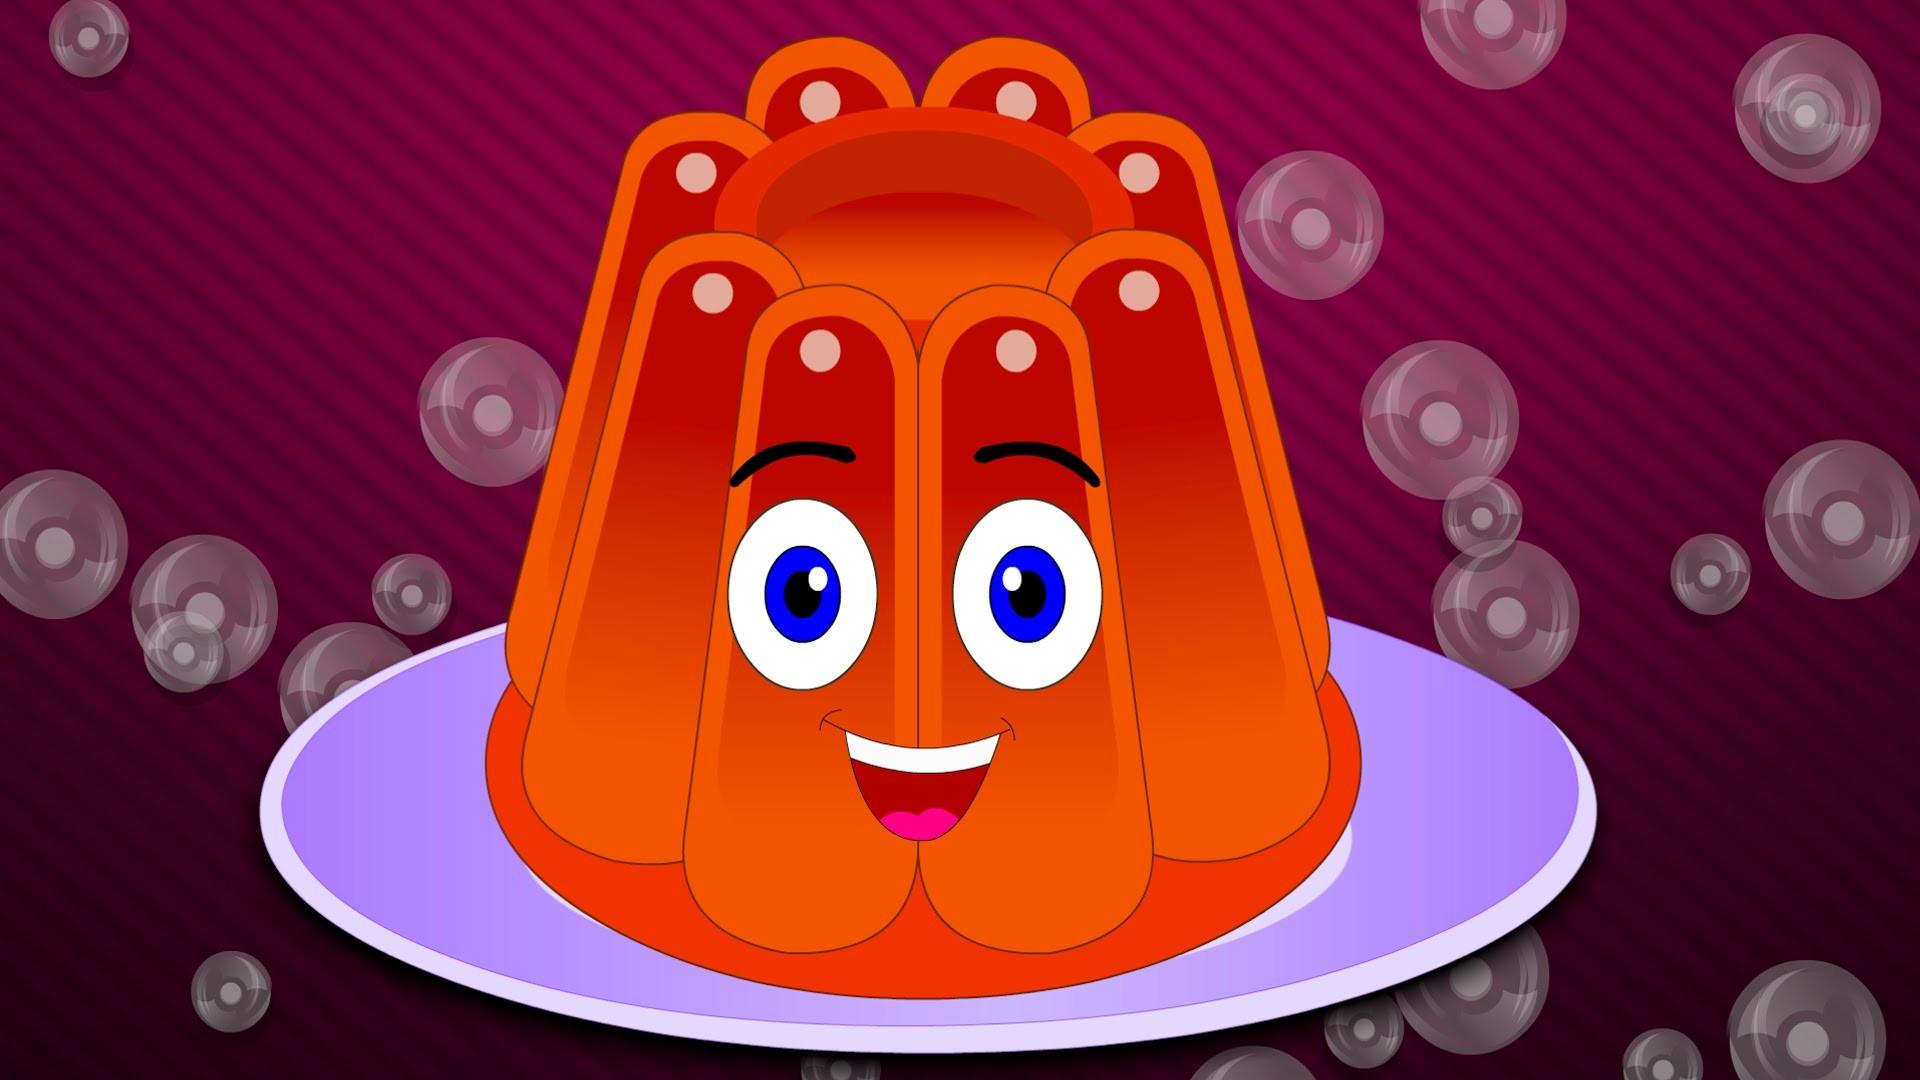 Jelly On a Plate Wibble Wobble Nursery Rhyme | Jelly On a Plate Nursery  Rhyme with Lyrics – YouTube